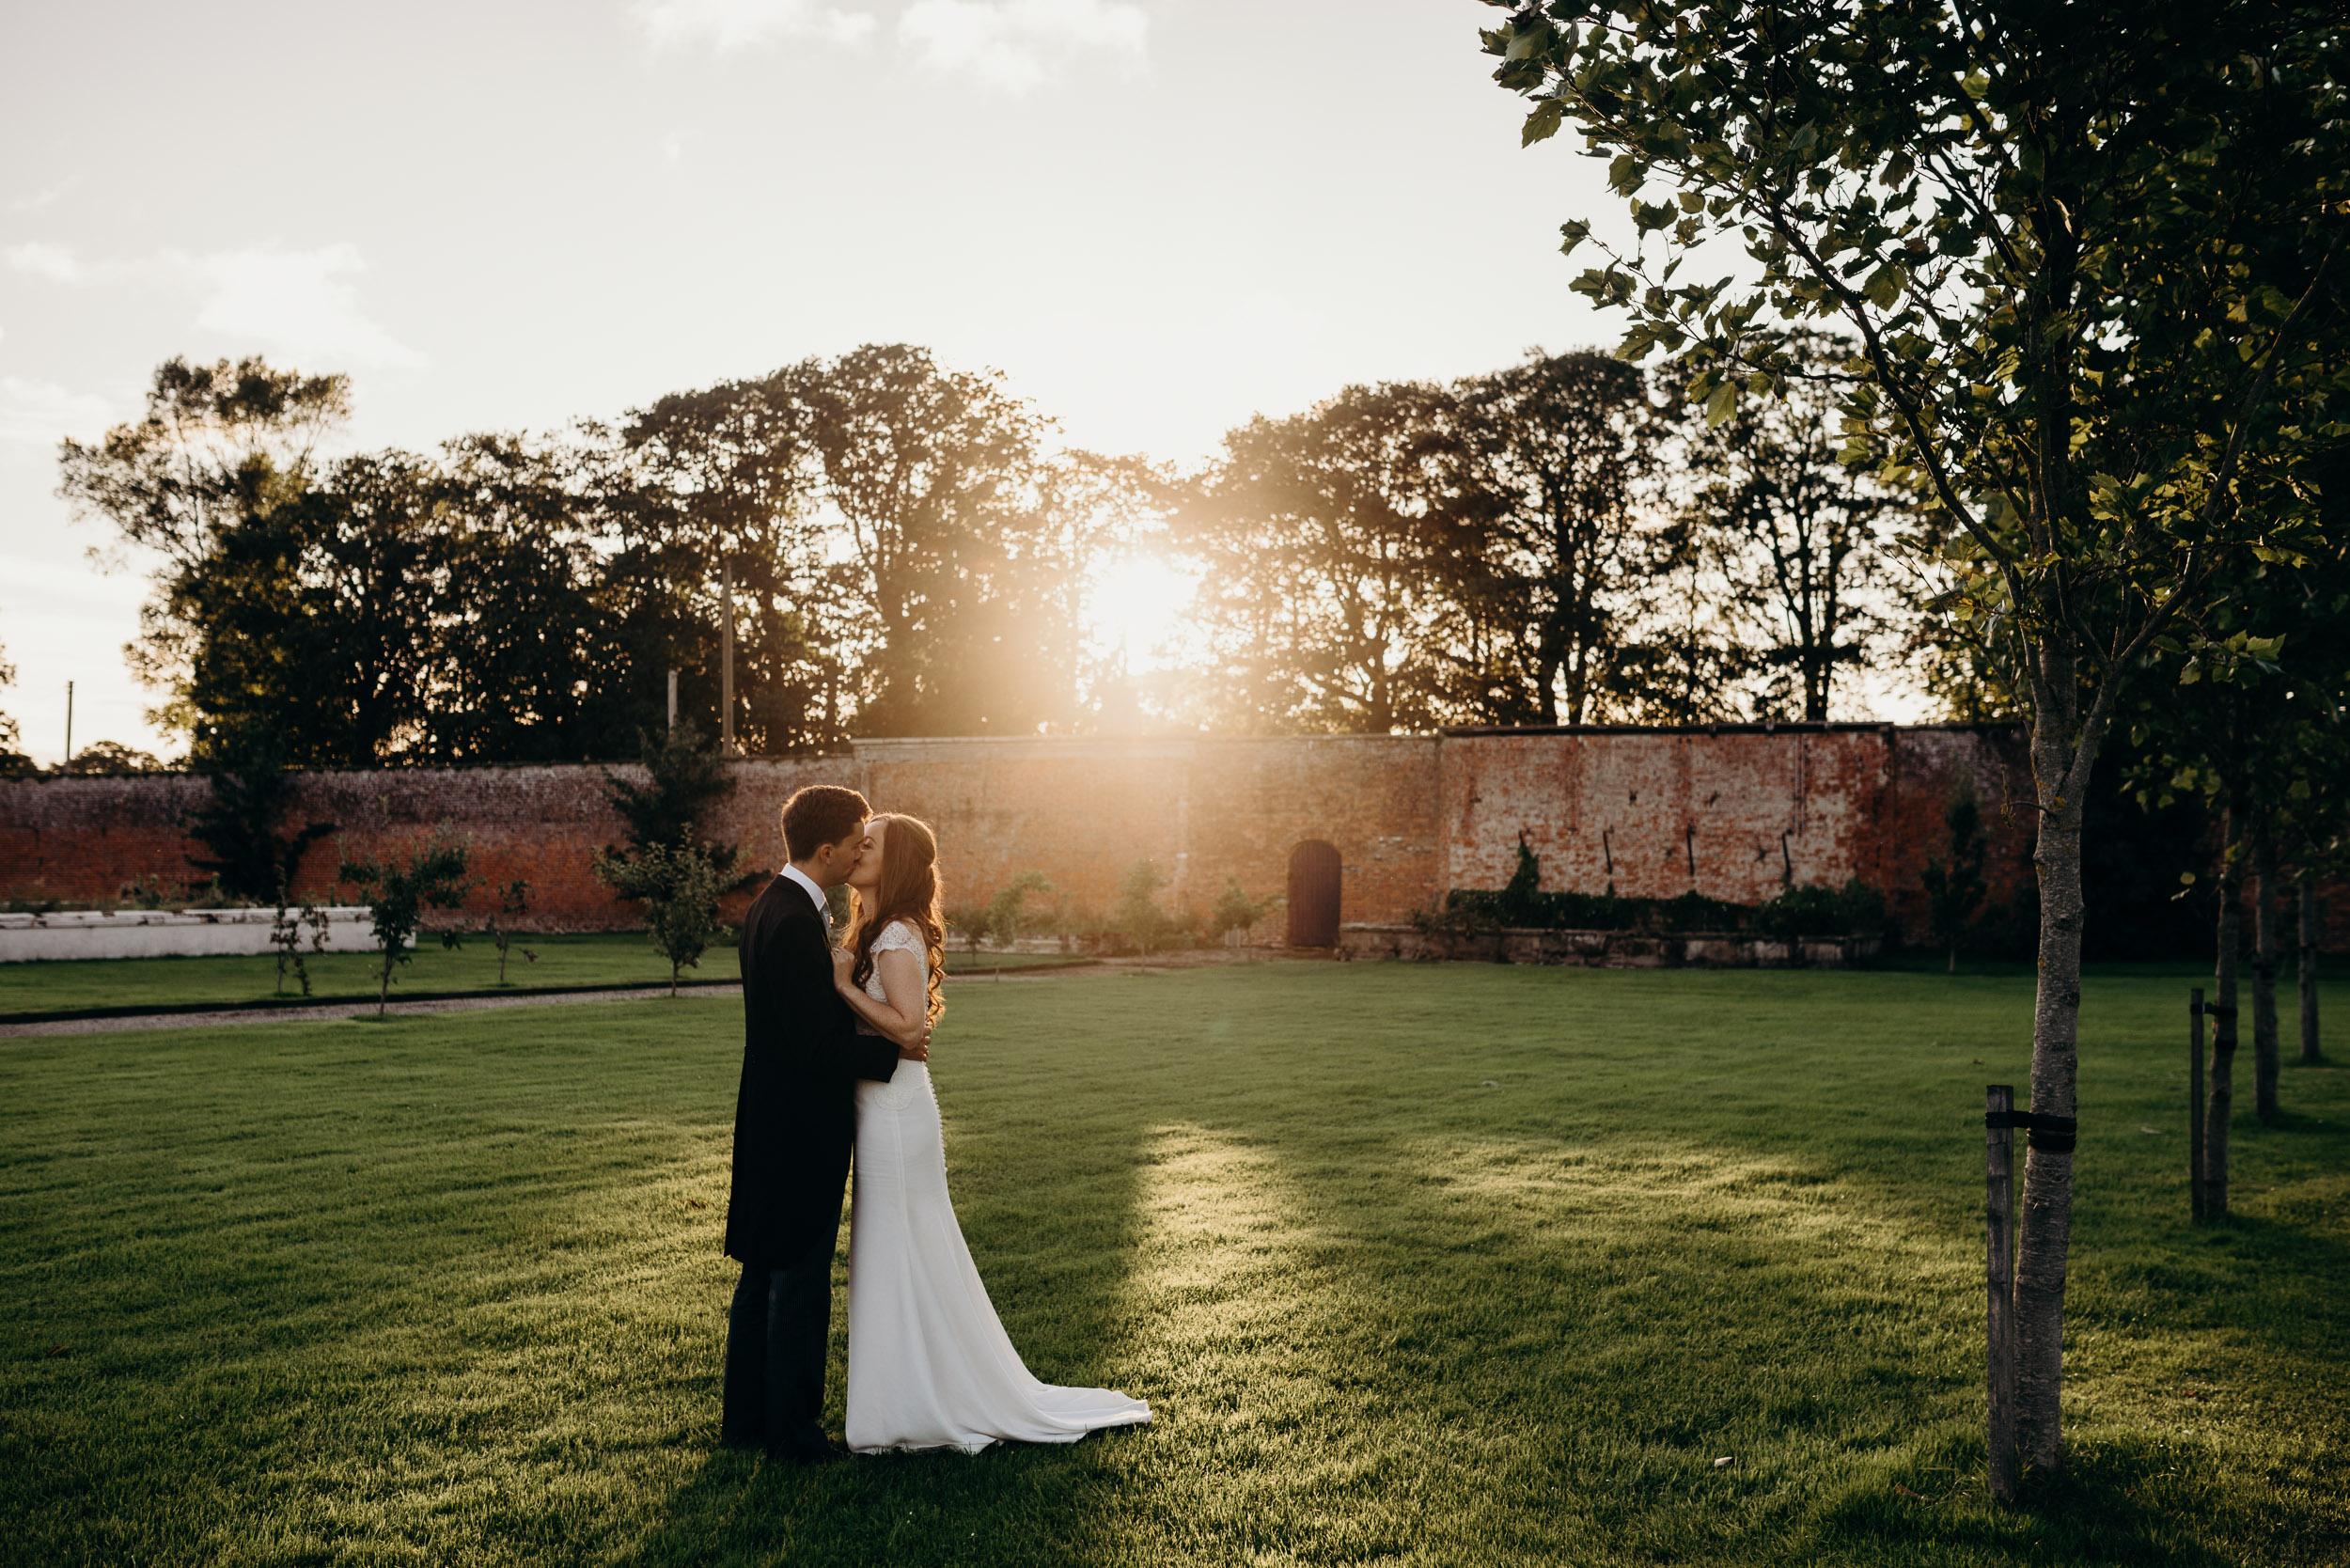 drenagh estate wedding photography-119.jpg